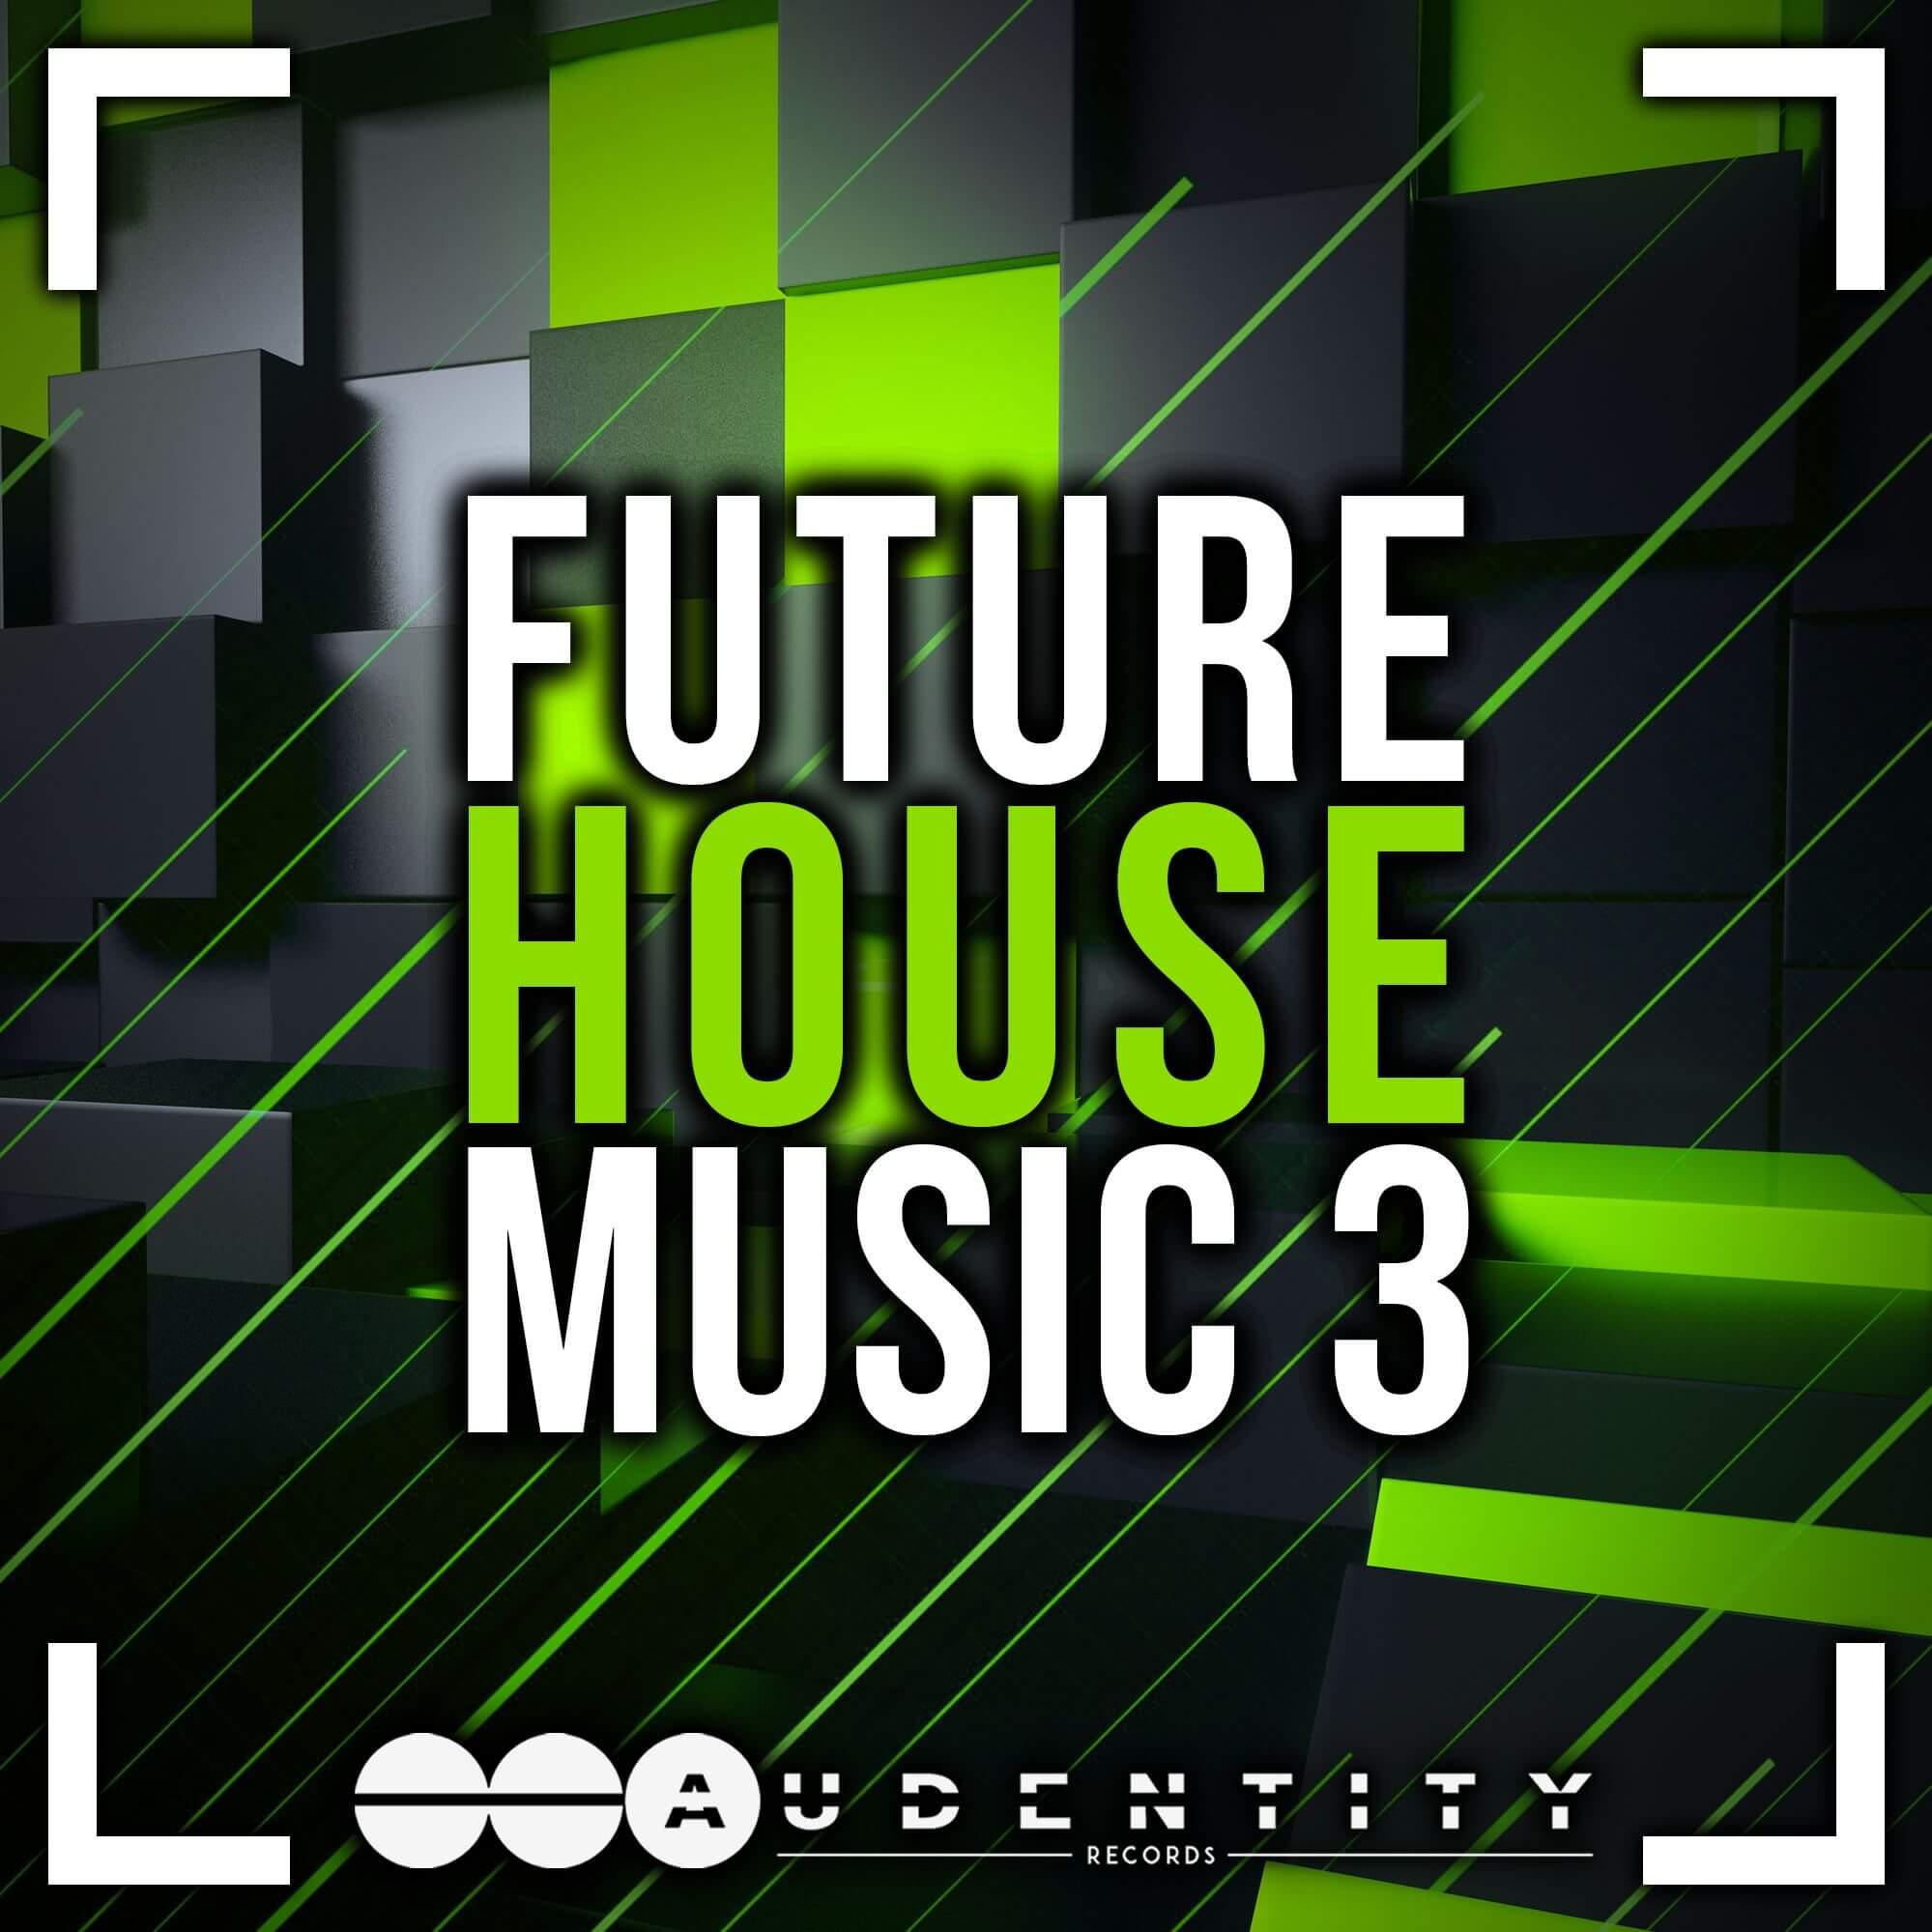 Future House Music 3 & Festival EDM Bounce 2 by Audentity